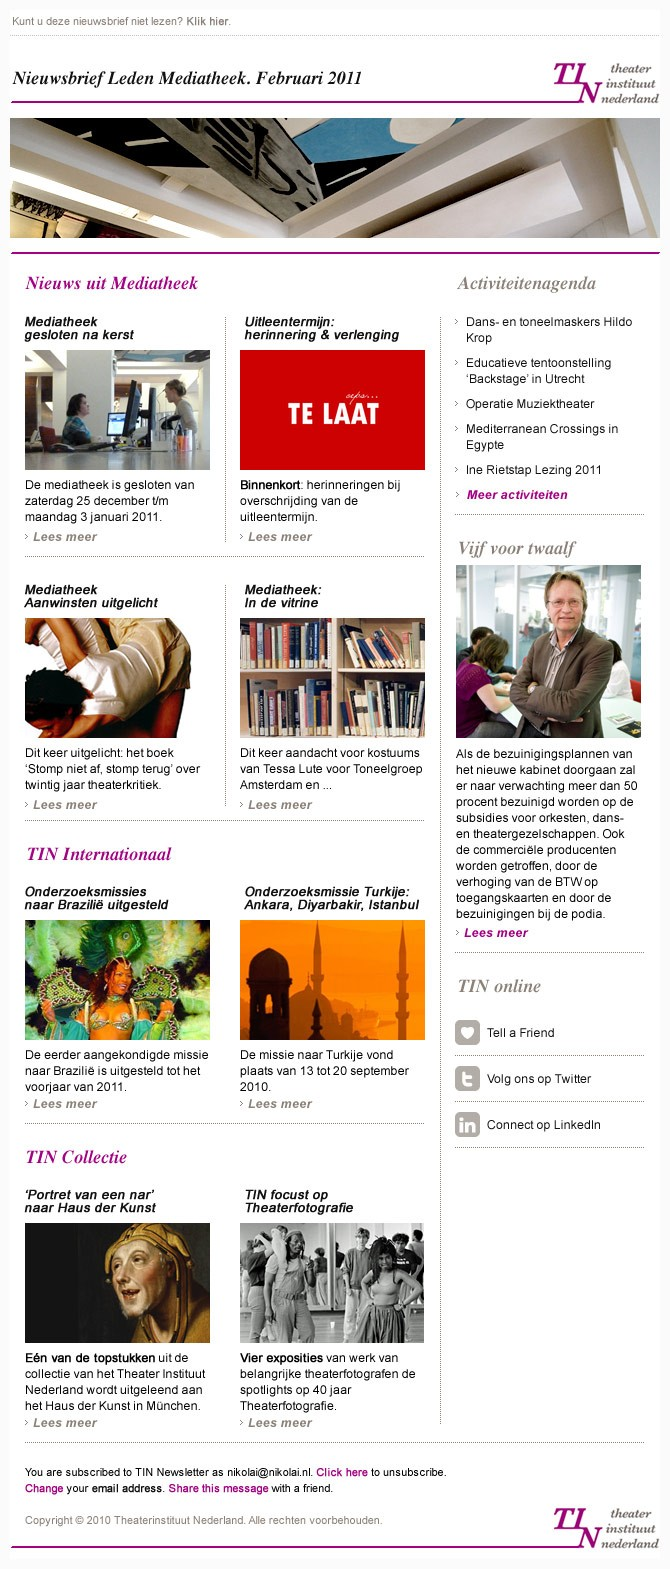 TIN Nieuwsbrief Leden Mediatheek